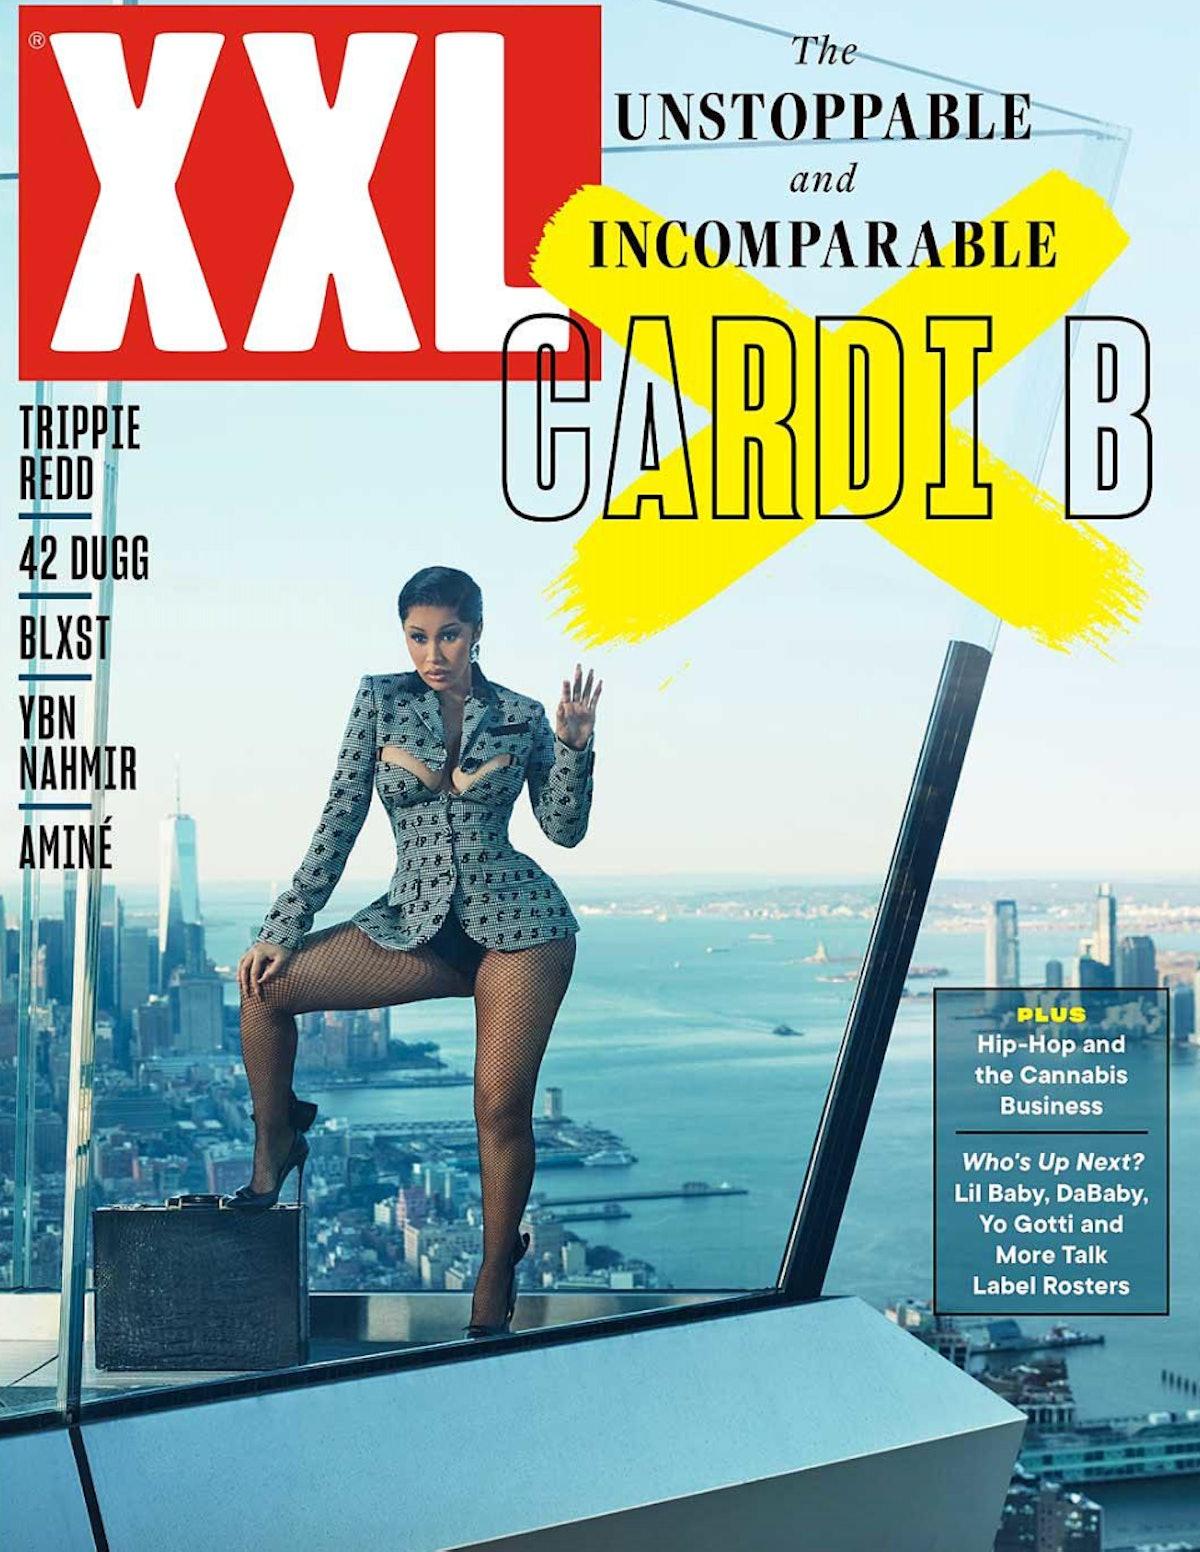 Cardi B graces the cover of XXL magazine.